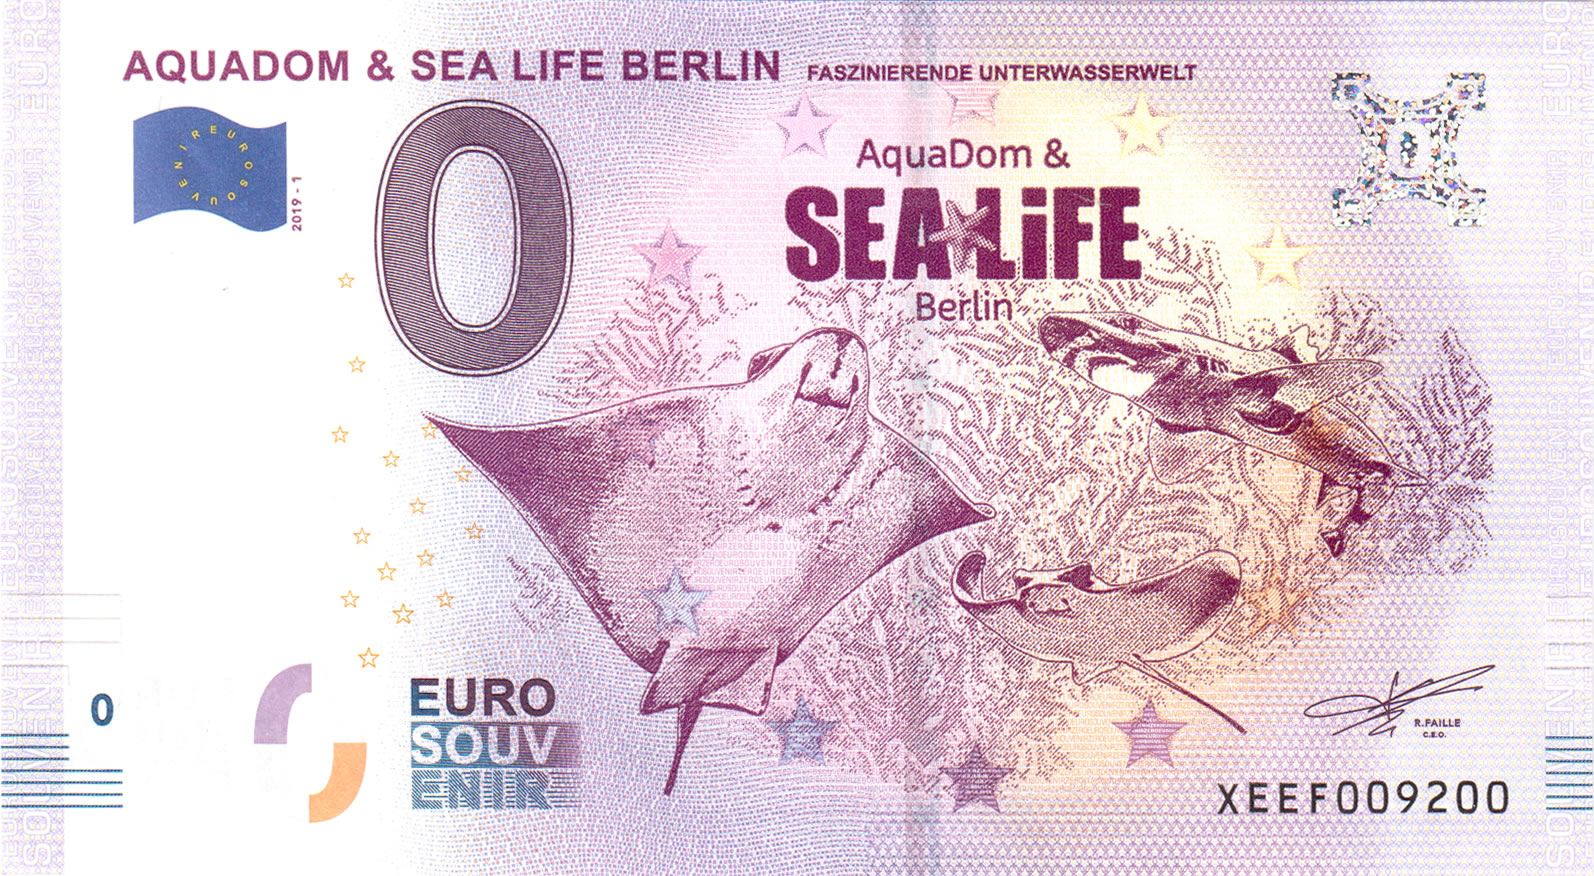 xeef  20191  aquadom  sea life berlin faszinierende